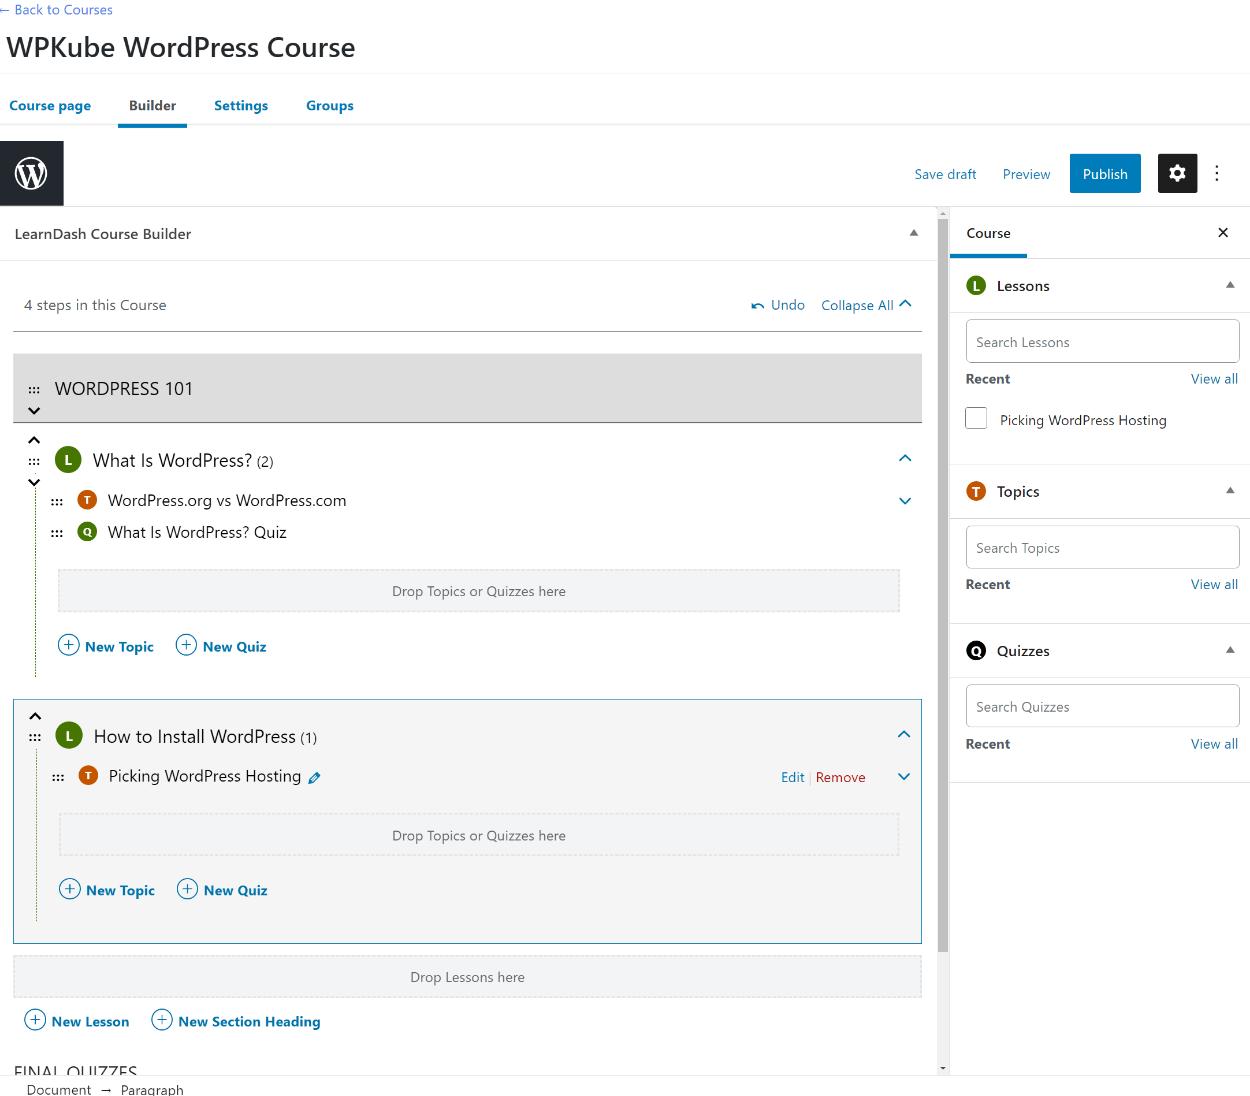 LearnDash Review 2021: ¿El mejor complemento LMS para WordPress? - 1633848779 484 LearnDash Review 2021 ¿El mejor complemento LMS para WordPress